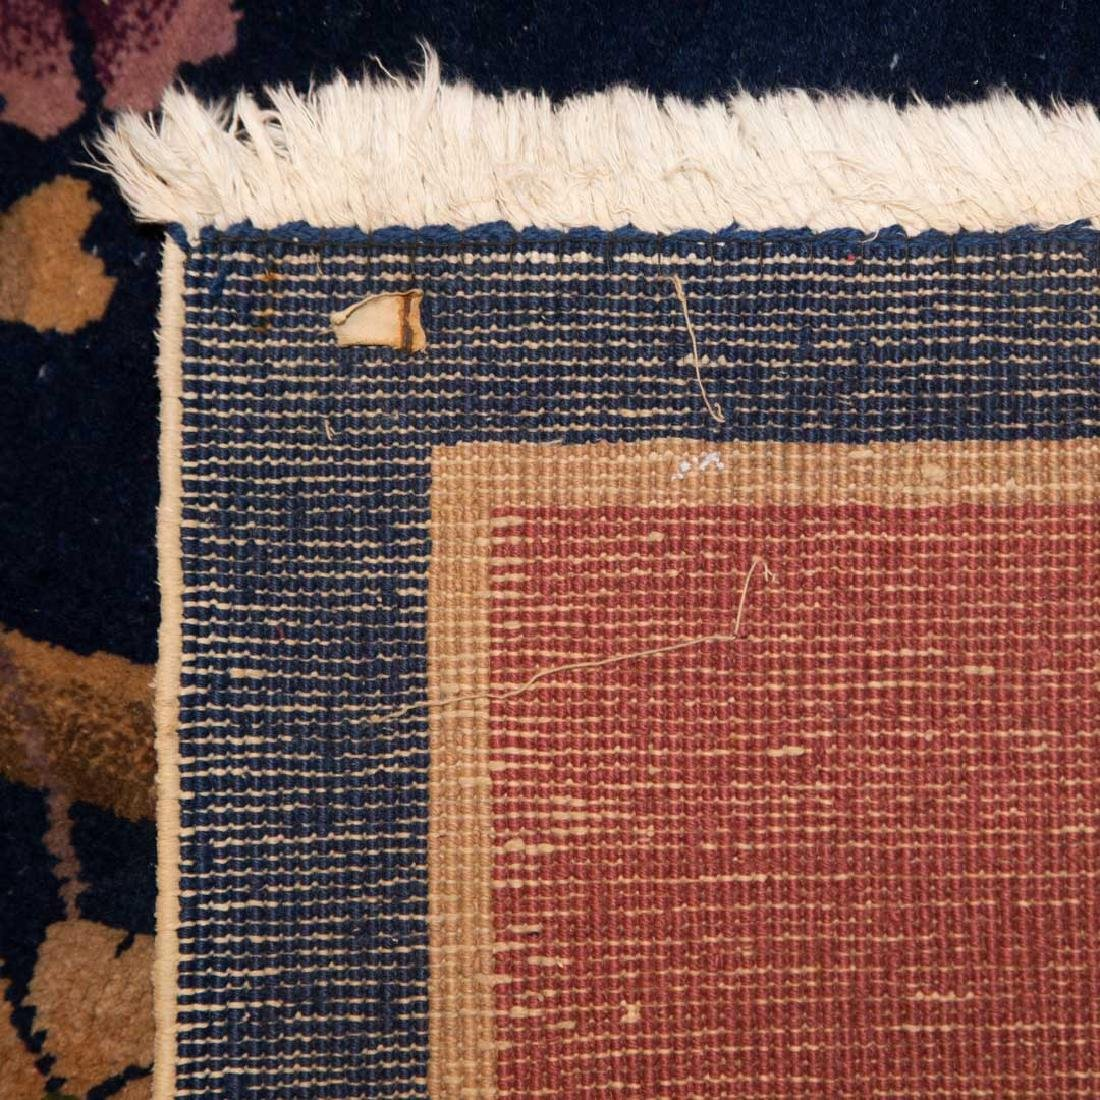 Antique Nichols Chinese carpet, approx. 8.9 x 11.6 - 2